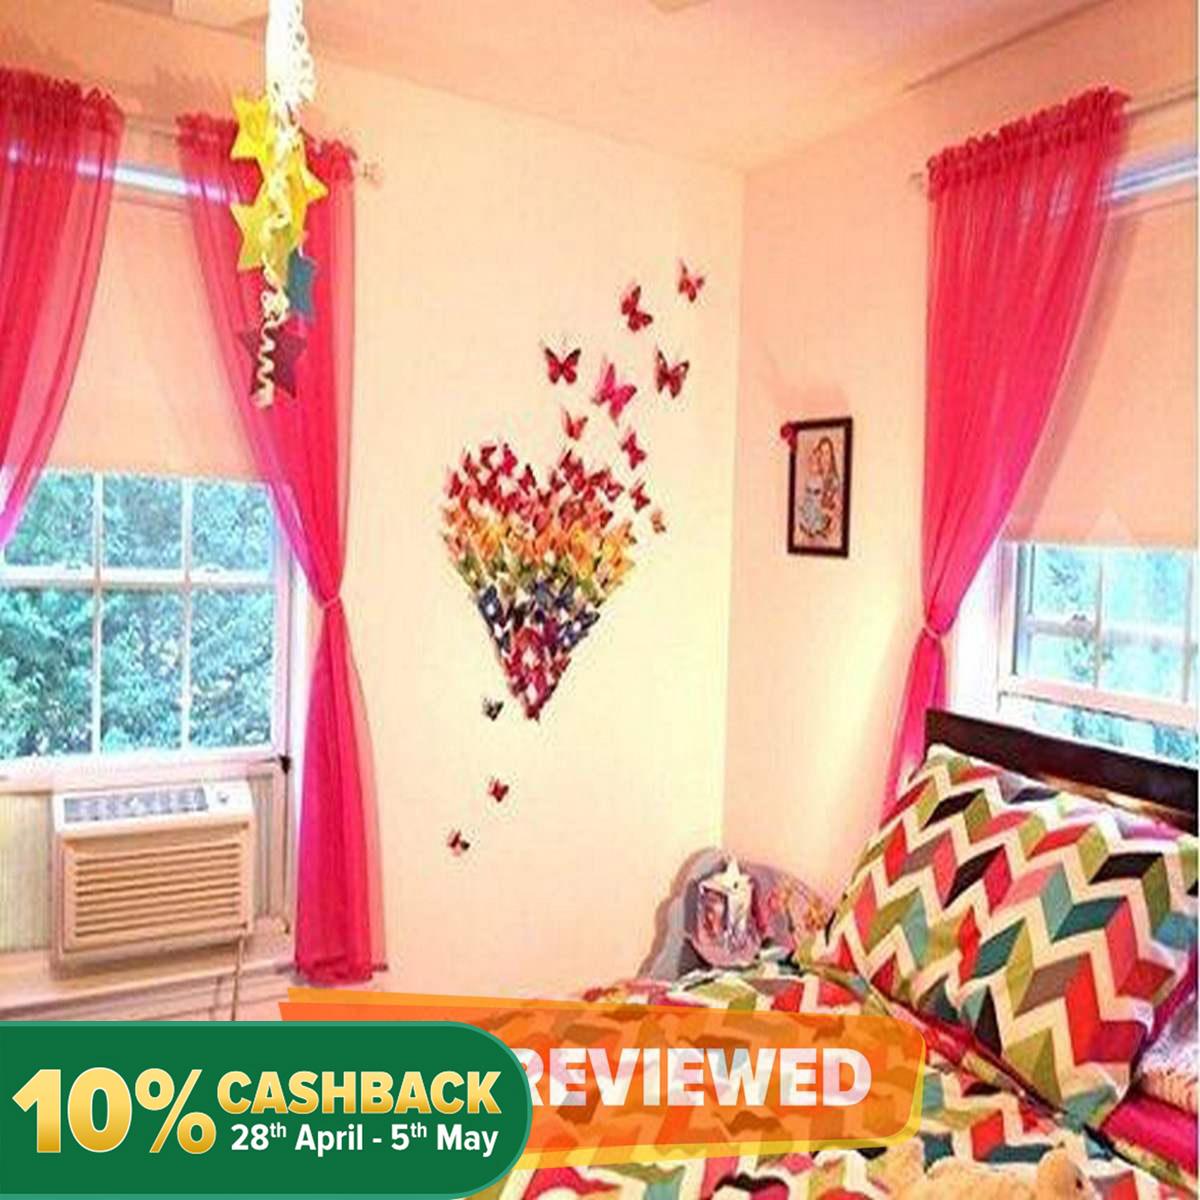 12 Pcs Butterfly Wall Stickers Decoration Magnet Butterflies on the wall DIY Wallpaper 3D PVC